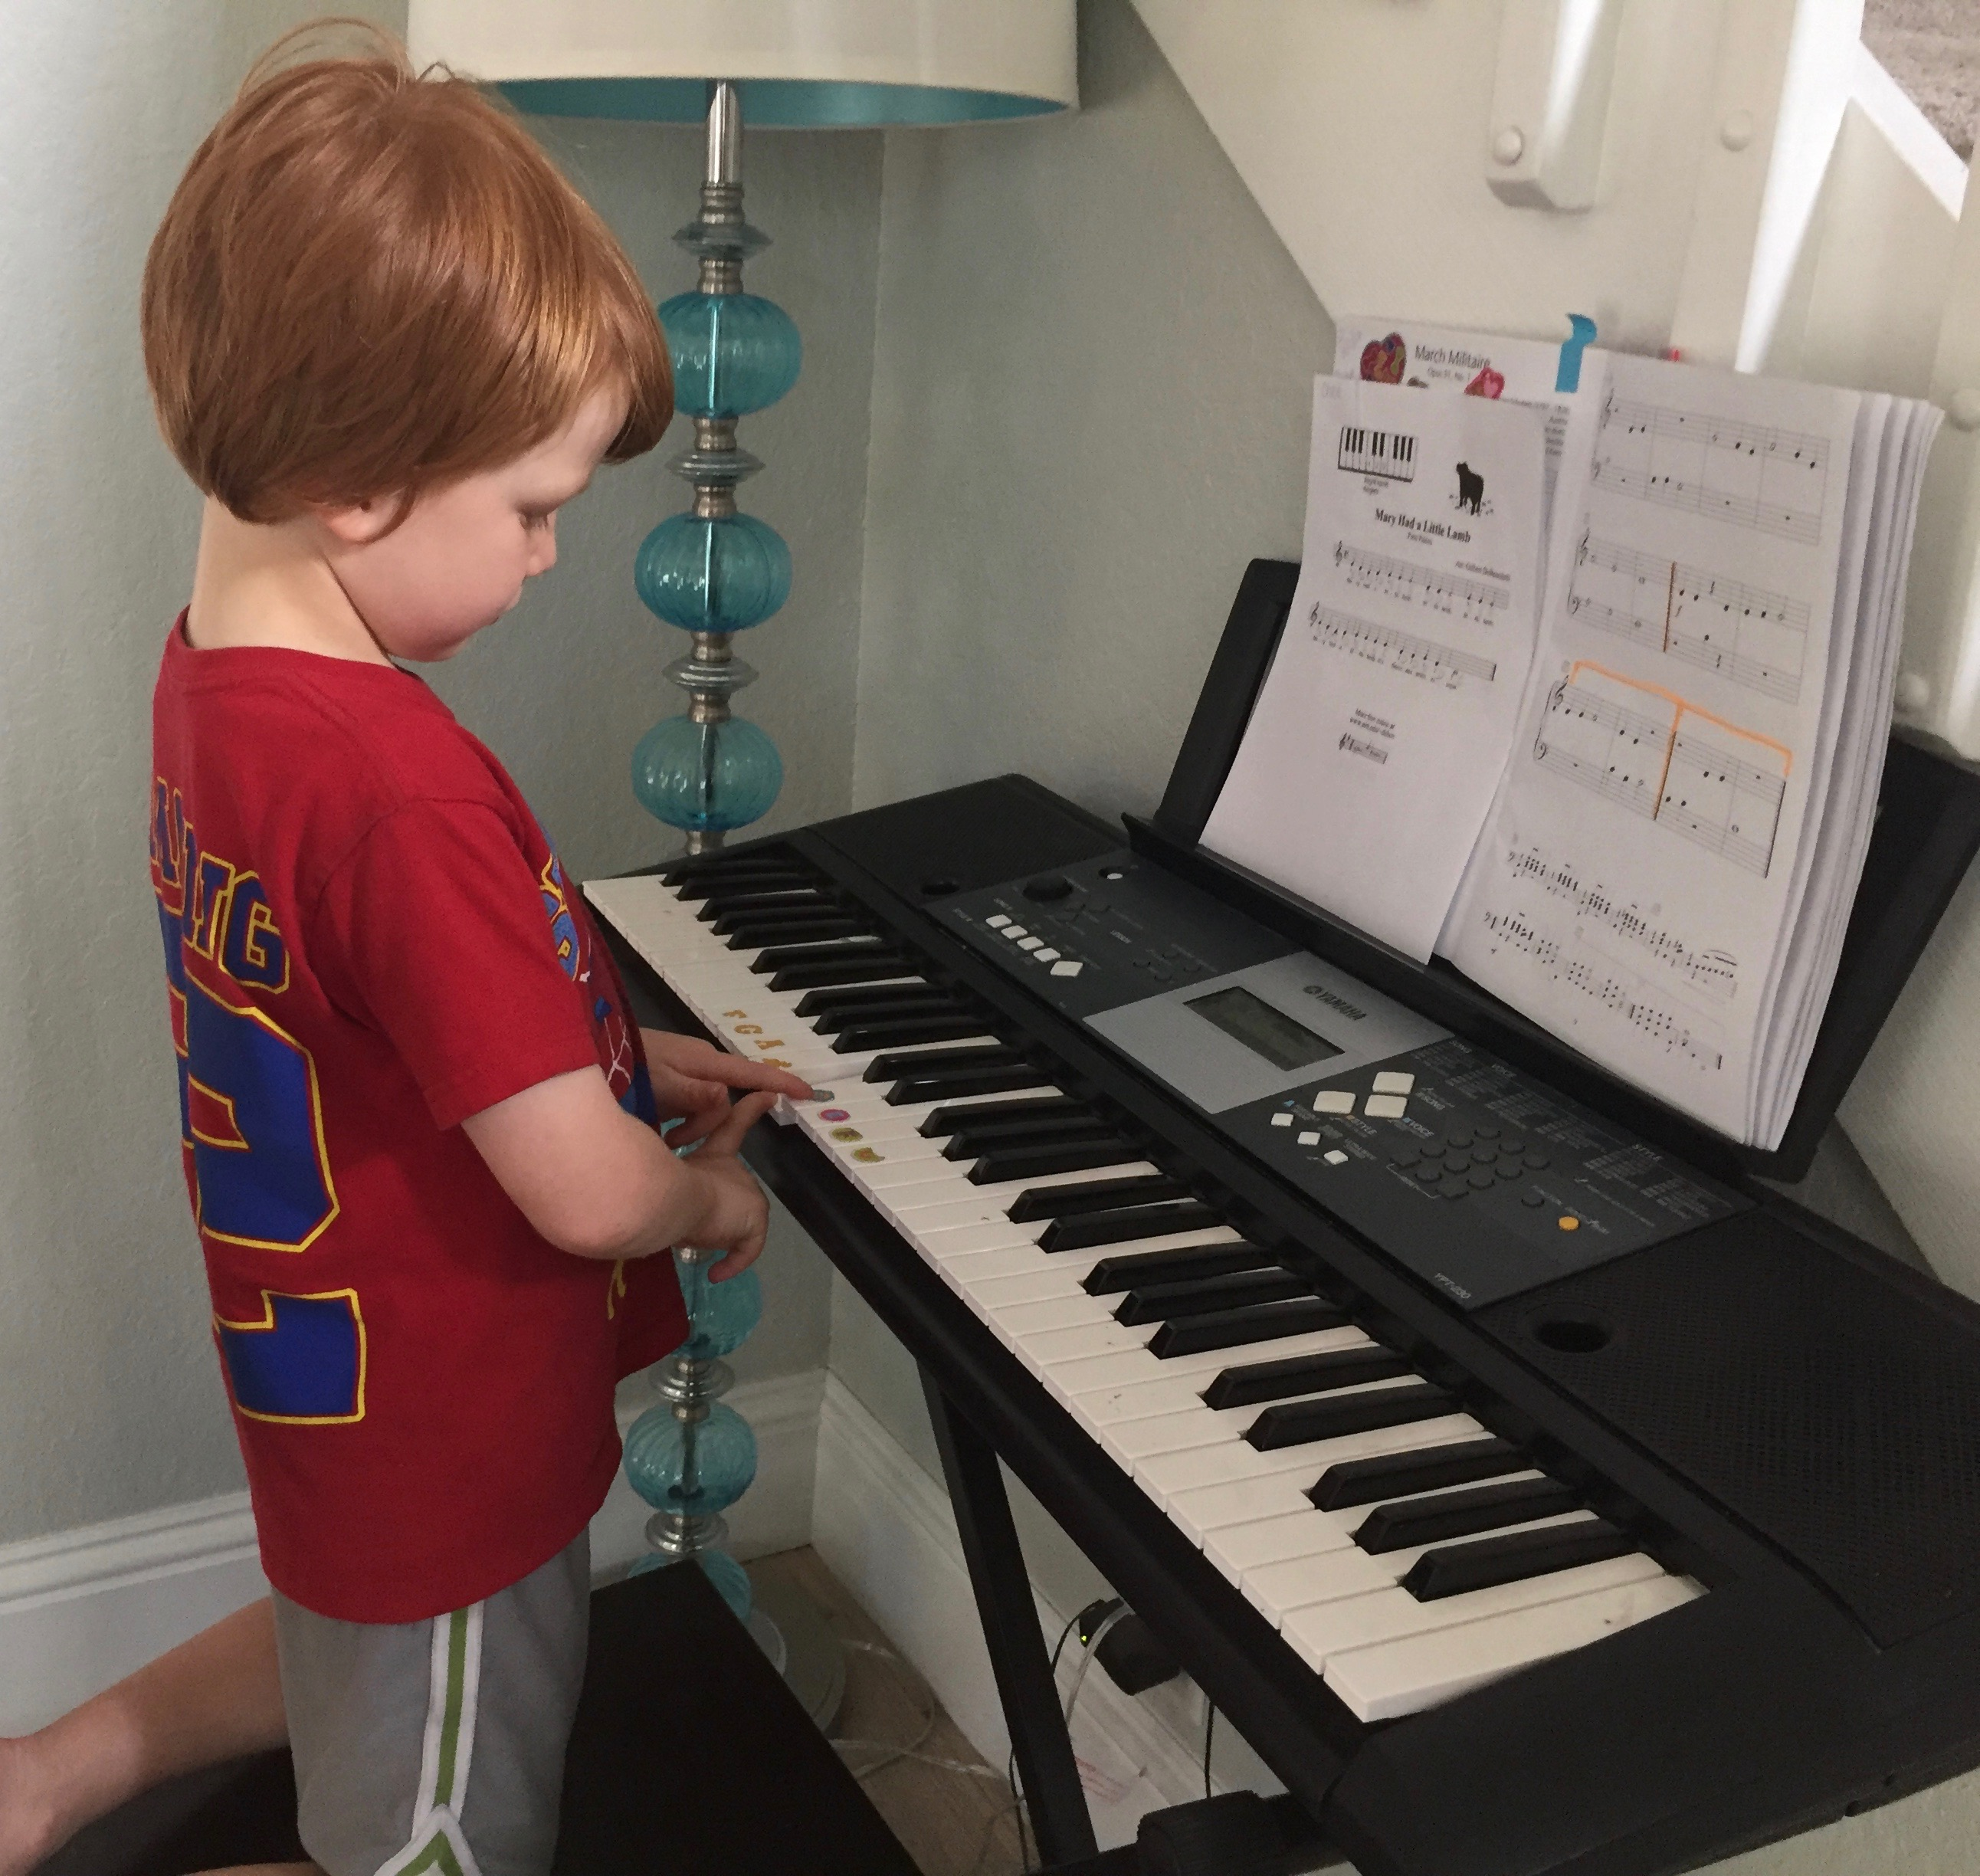 Chase playing keyboard